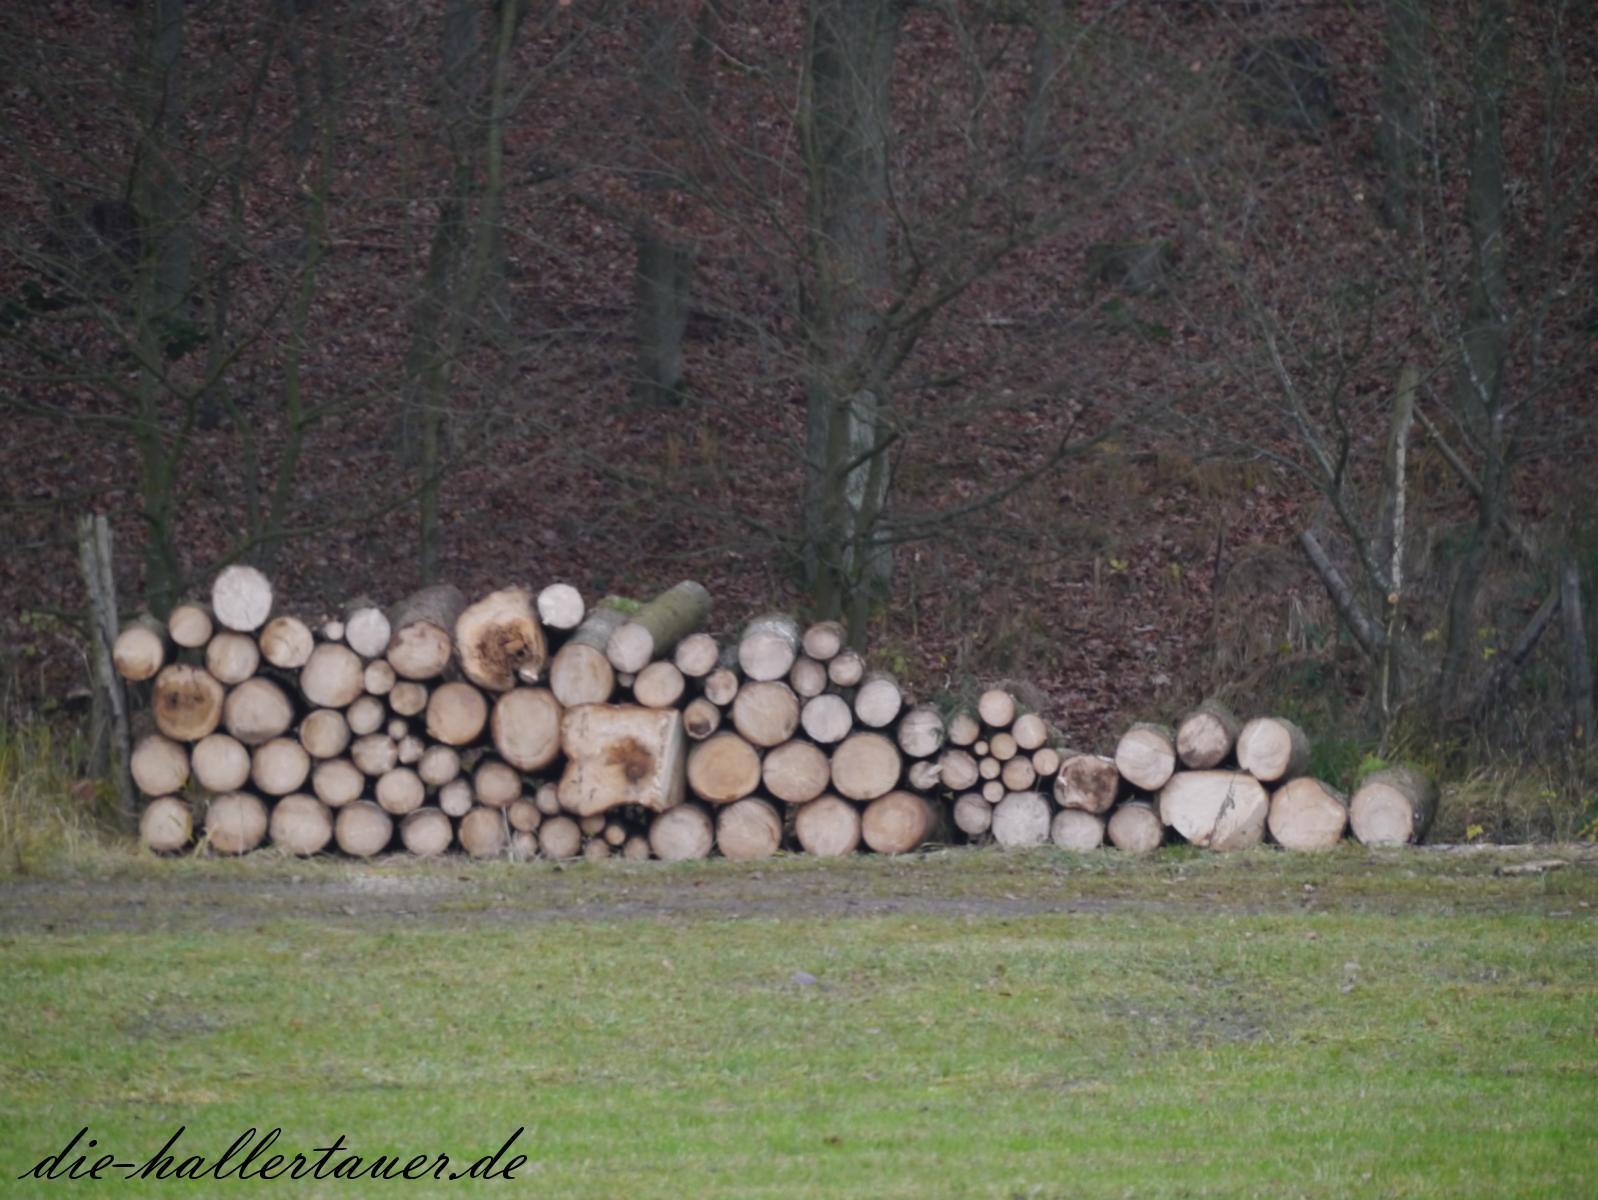 Holz vor da Hüttn